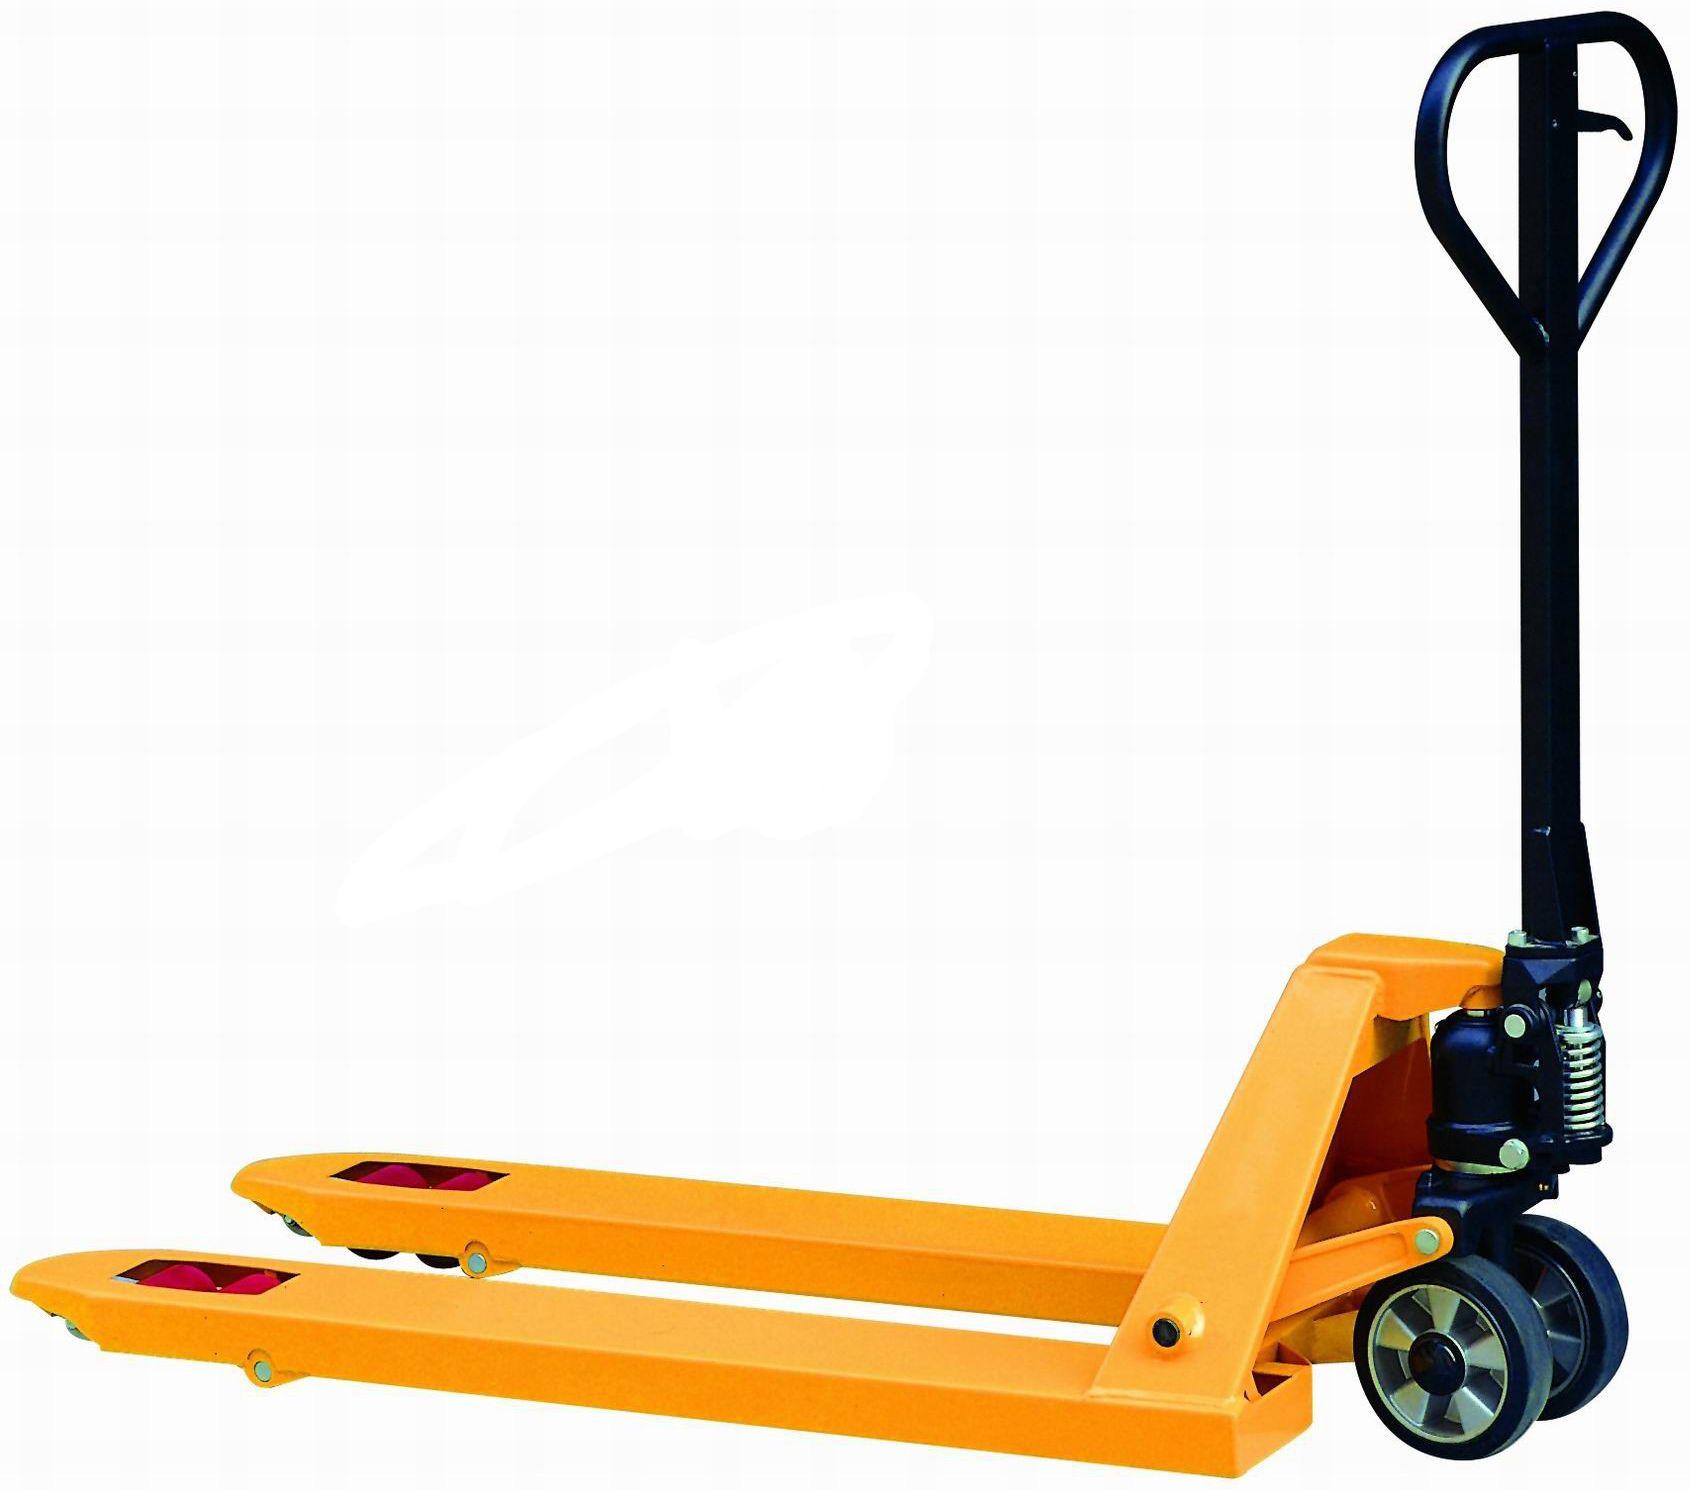 Transpallet Novamach N1/GP - portata 2500kg - 1150x540mm - 1 rullo